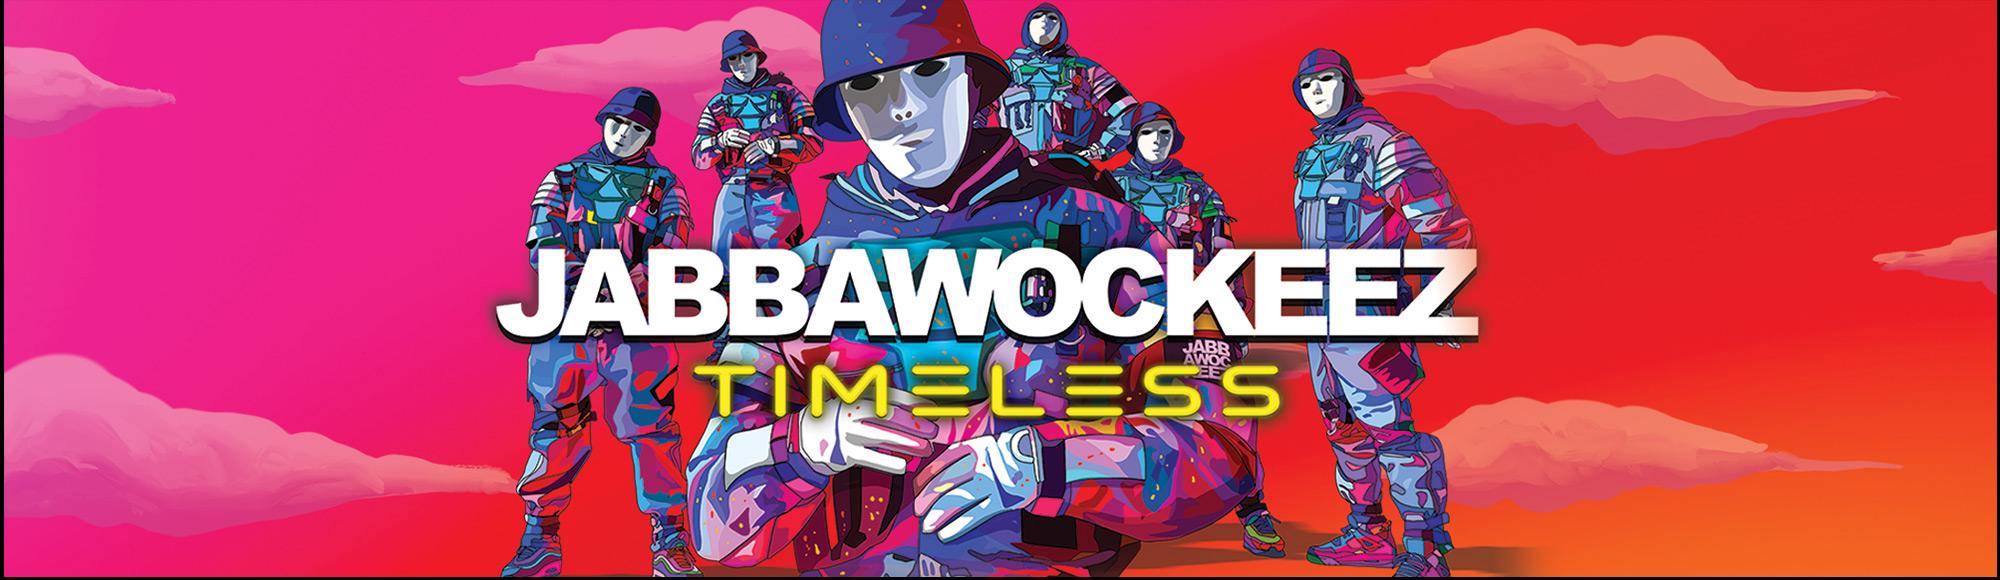 Jabbawockeez show